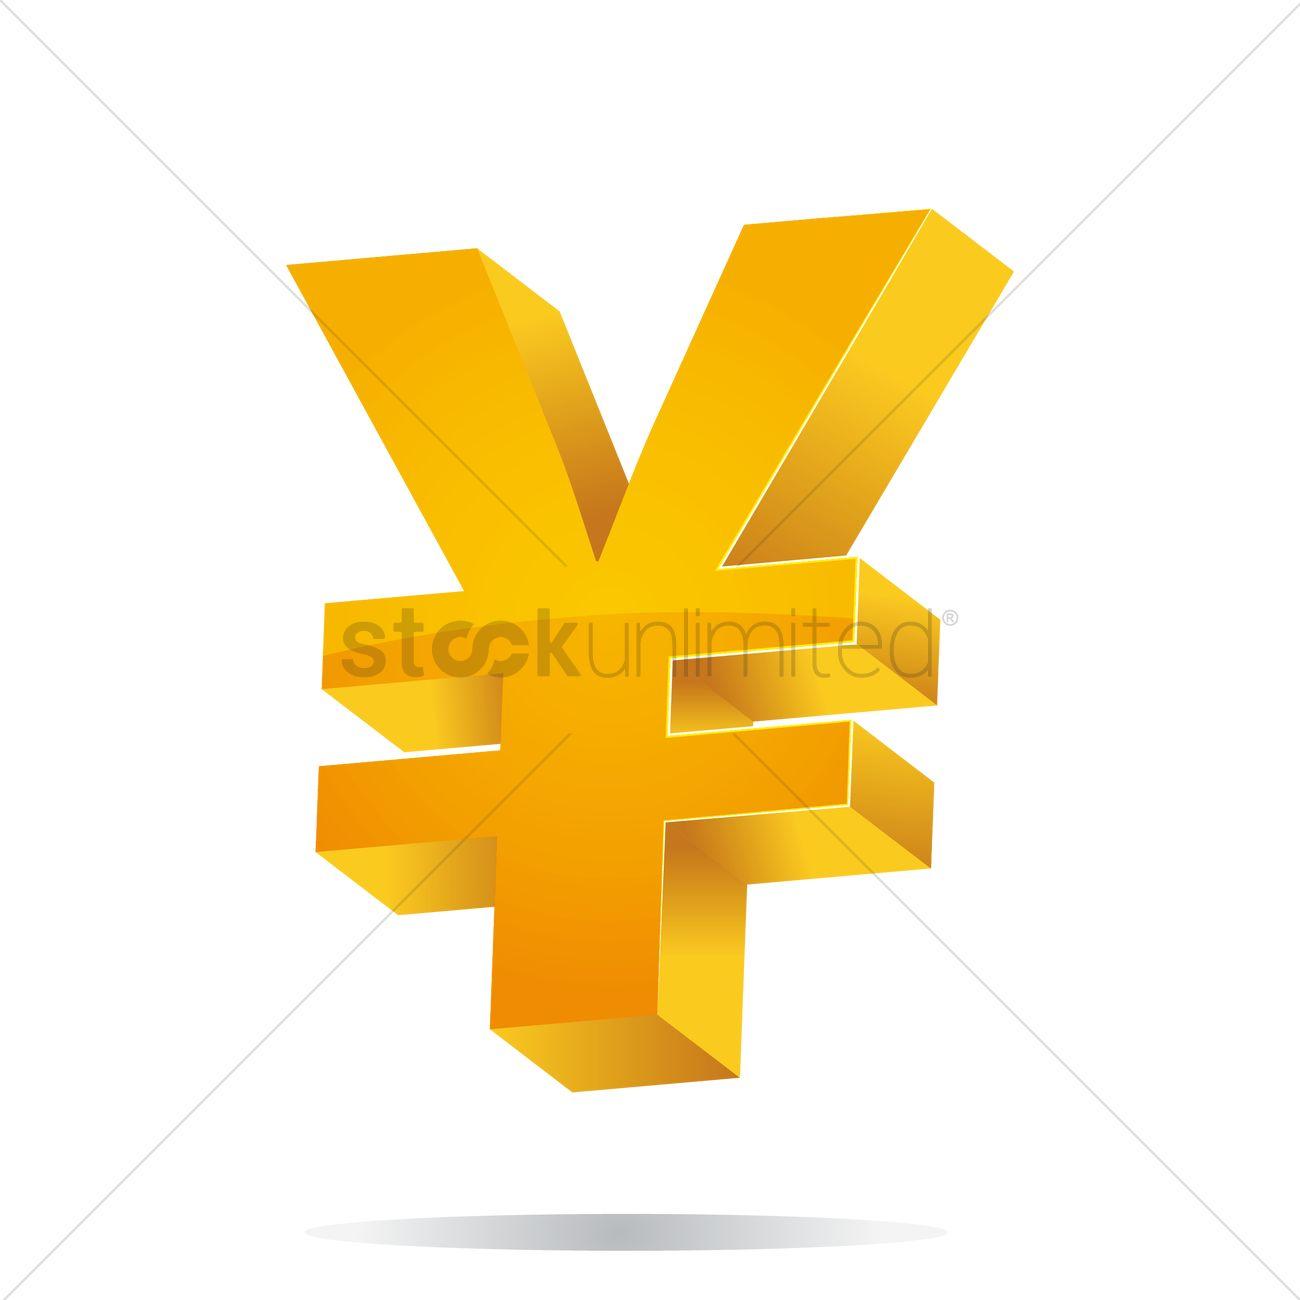 Icon icons design designs visualization visualize set sets yen symbol biocorpaavc